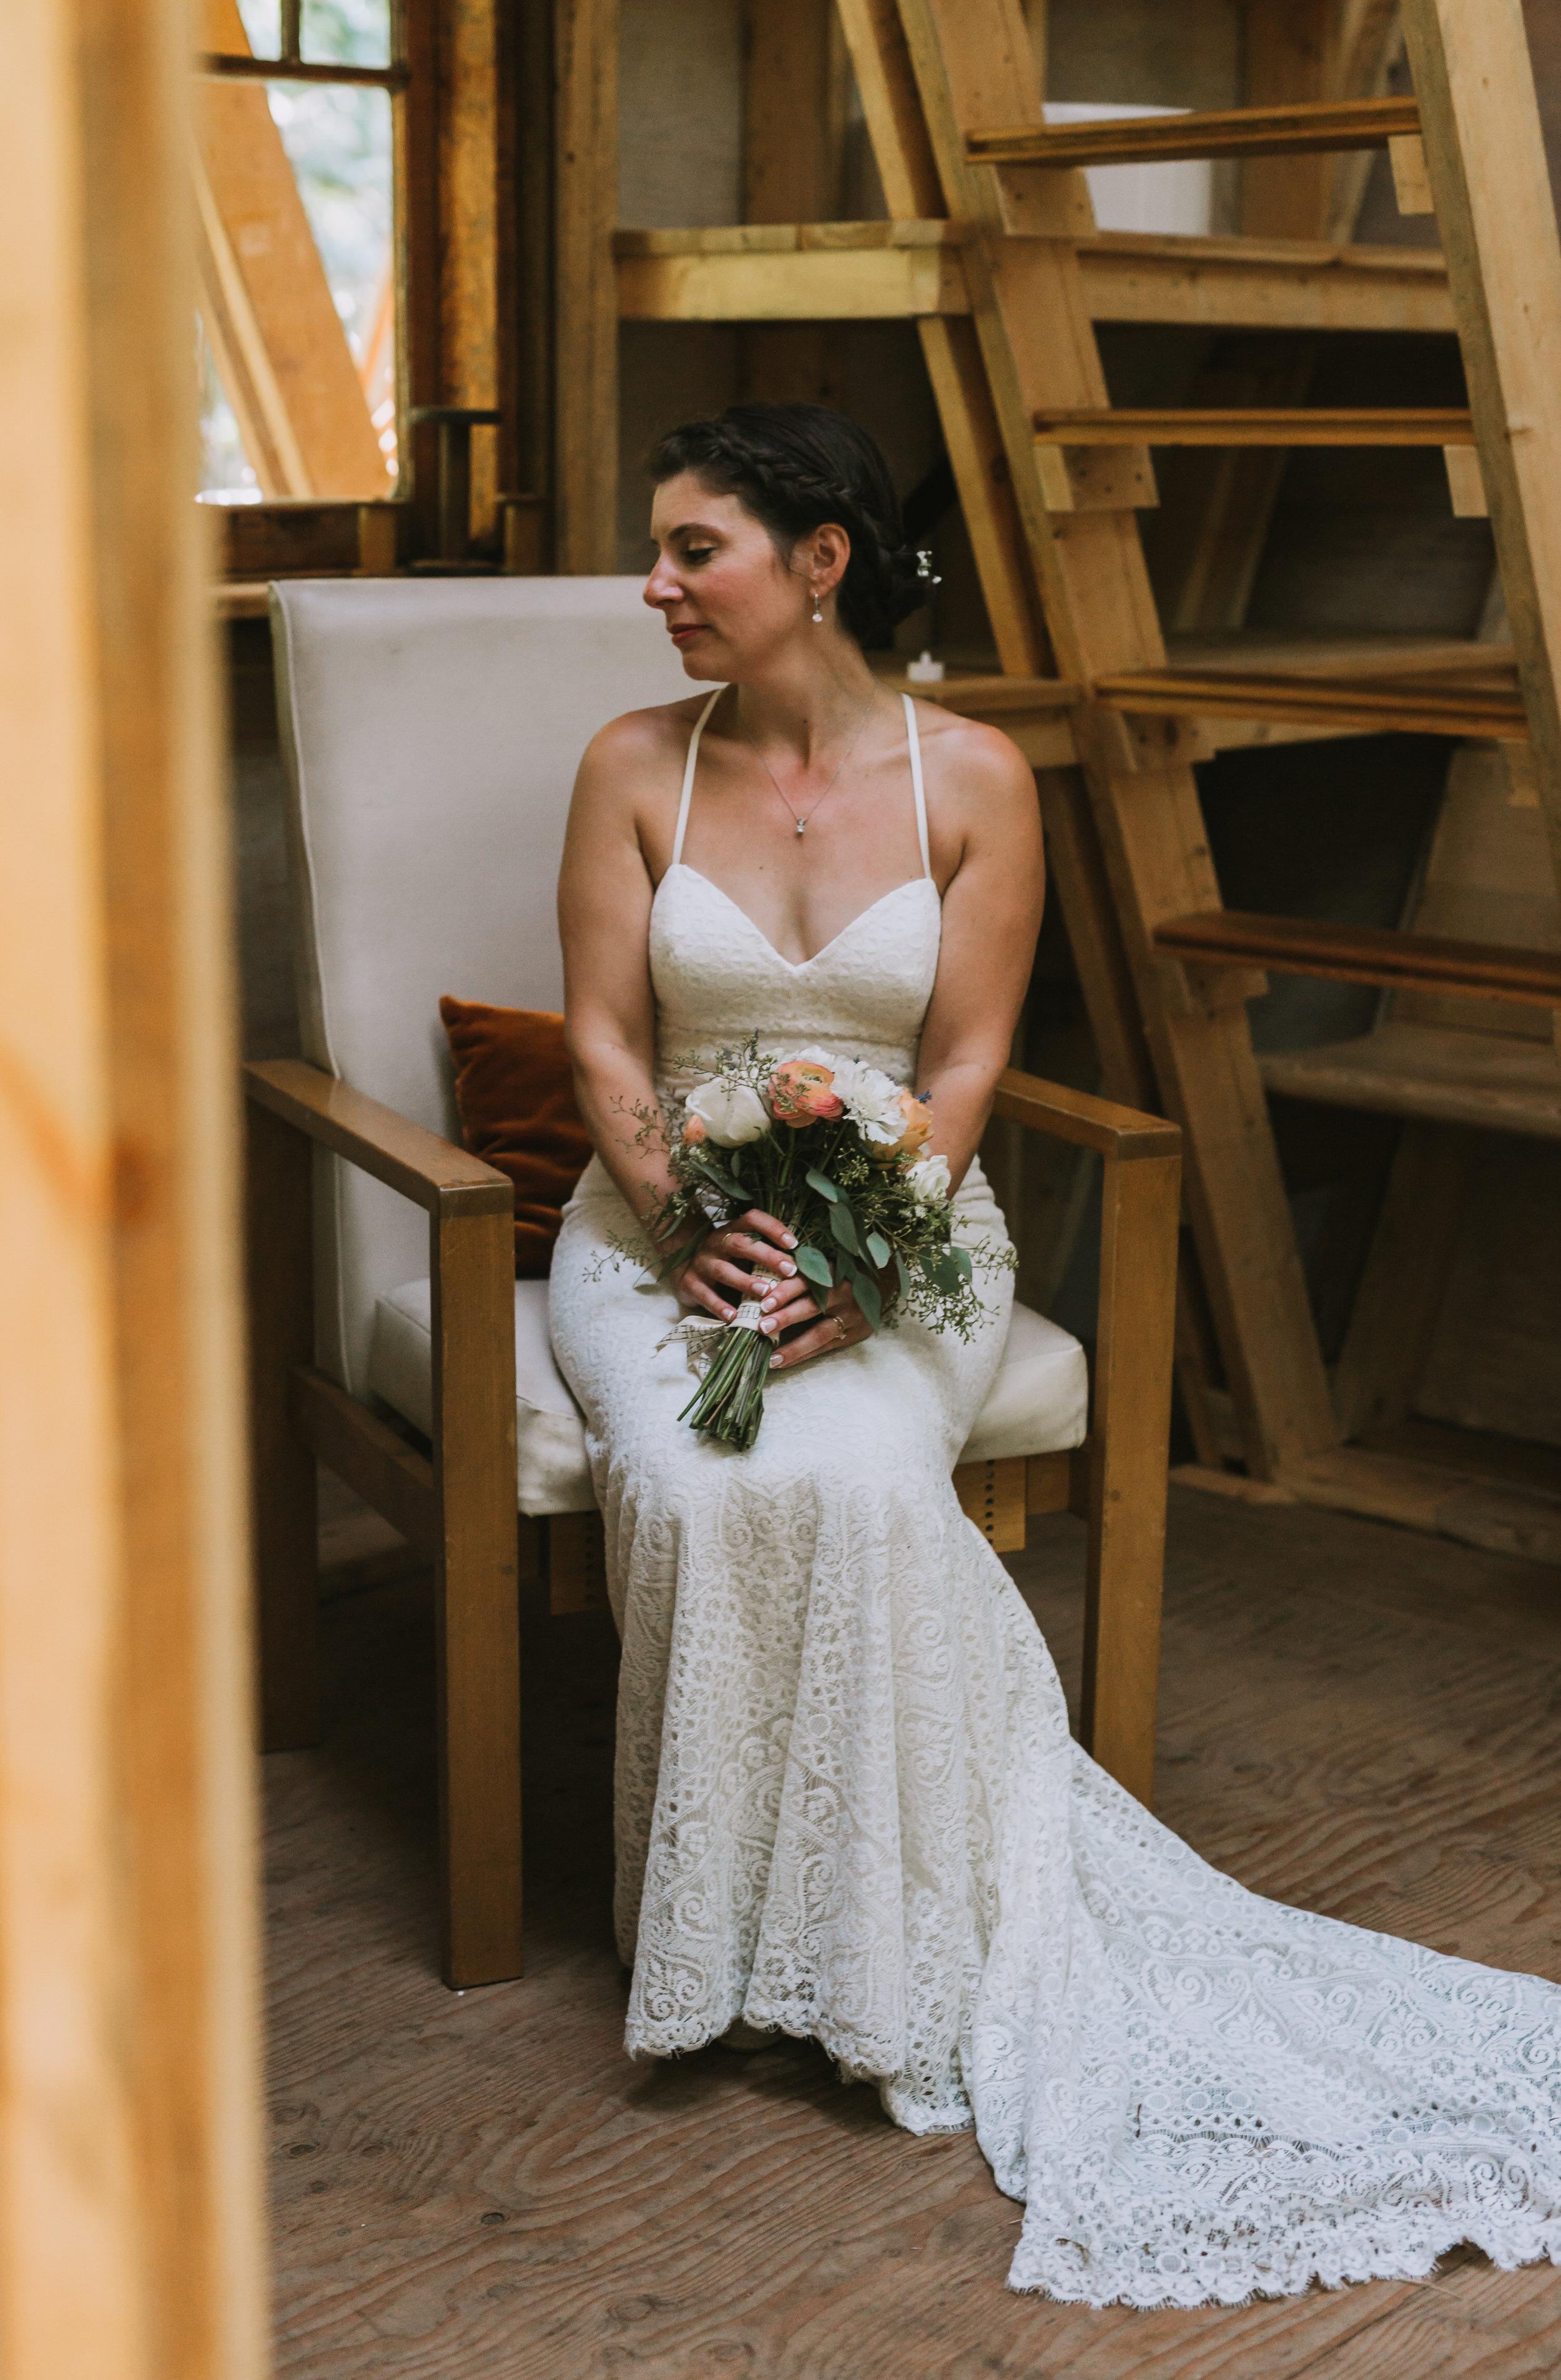 Camp Fircom Wedding - Vancouver Wedding Photographer & Videographer - Sunshine Coast Wedding Photos - Sunshine Coast Wedding Photographer - Jennifer Picard Photography - IMG_1904.jpg